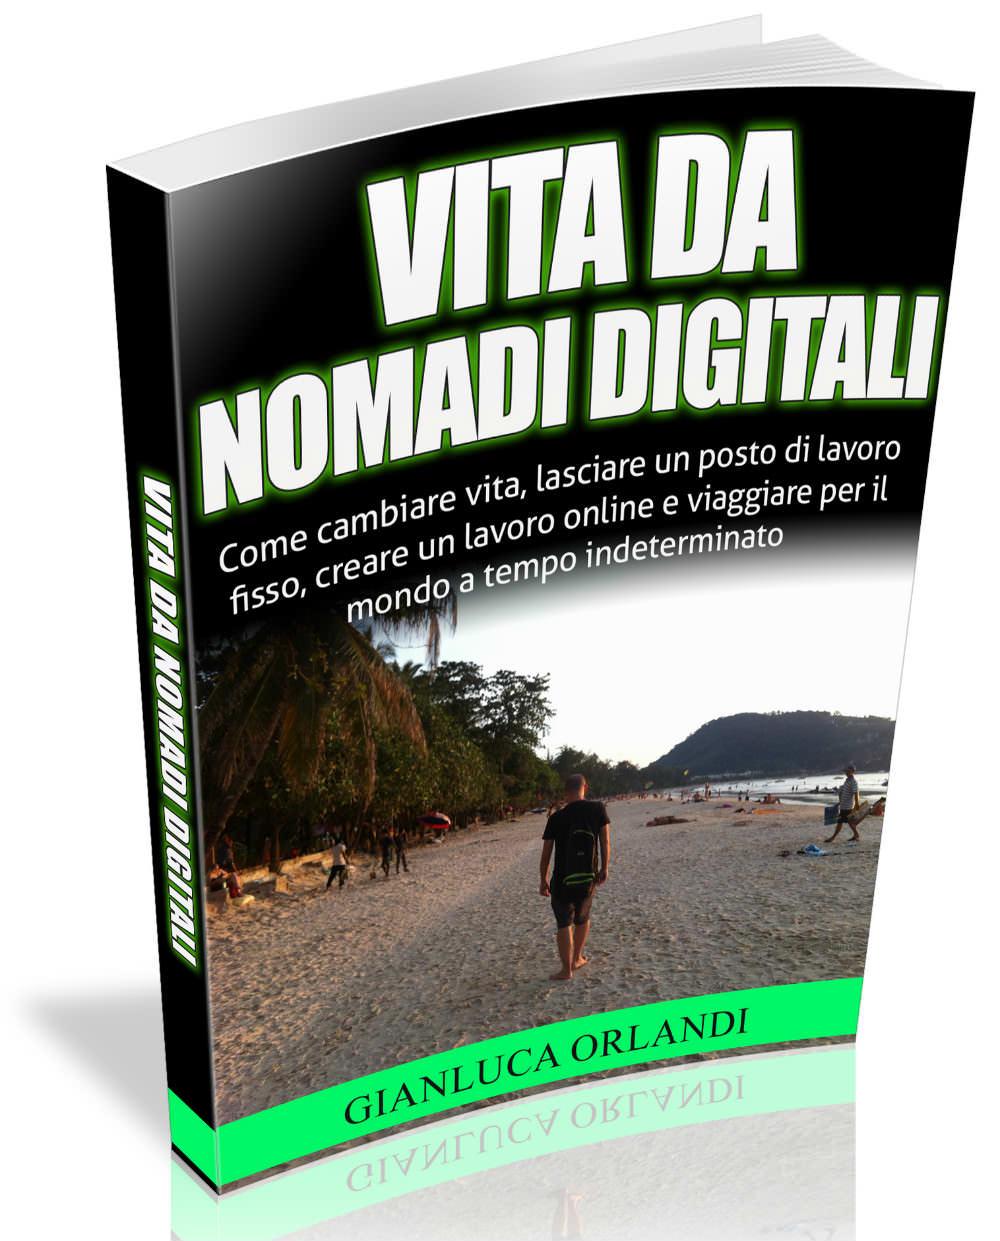 ebook vita da nomadi digitali